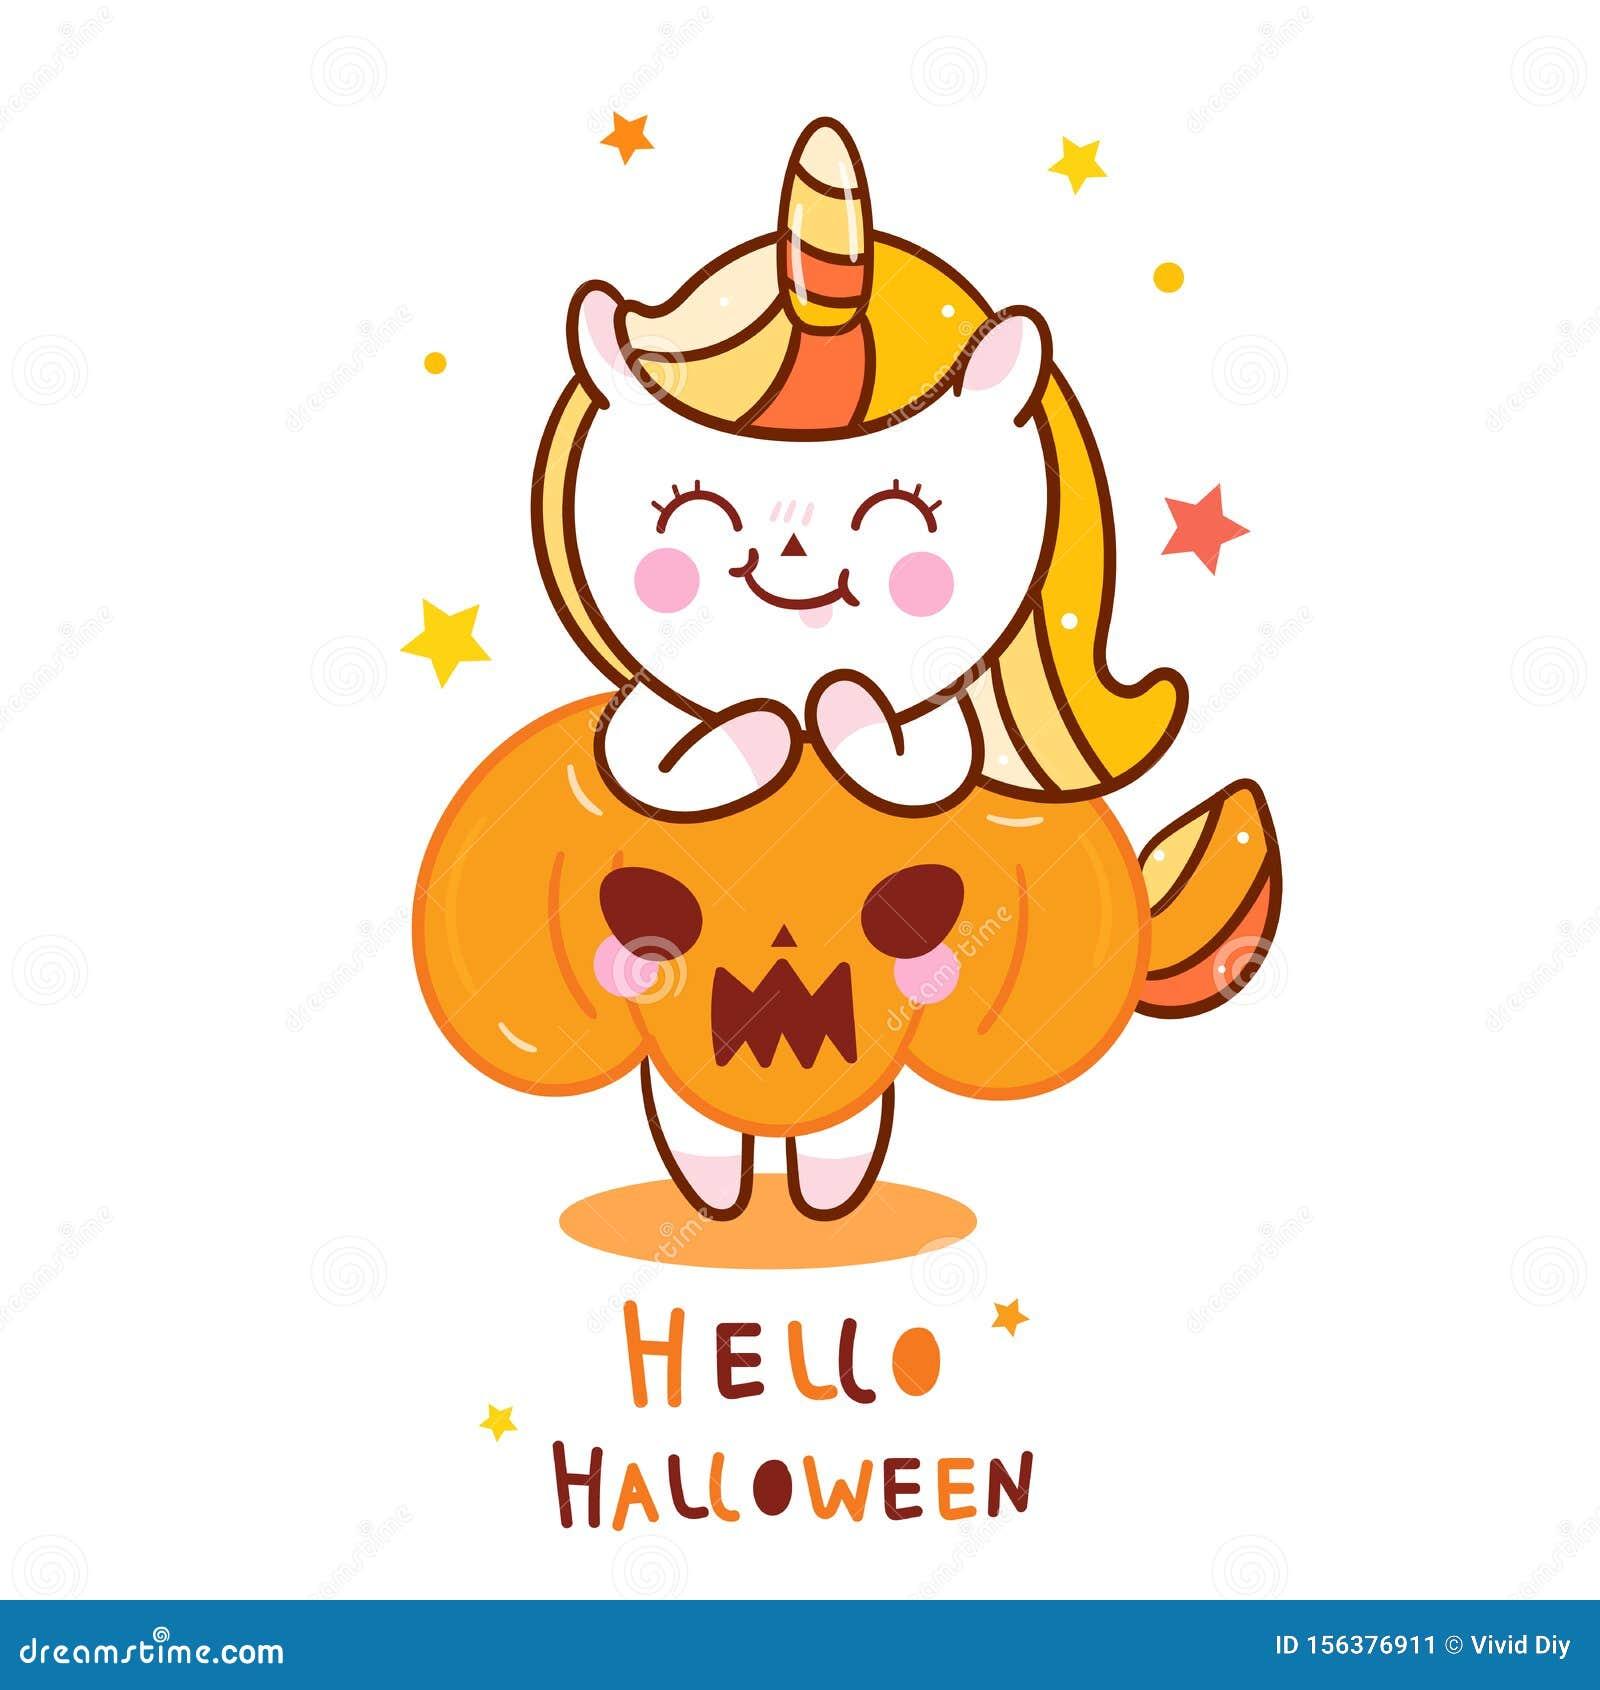 Cute Unicorn Halloween Vector With Pumpkin Cartoon Pretty Pony Horse Trick Or Treat Holiday Festival Doodle Nursery Decor Stock Vector Illustration Of Draw Bakery 156376911